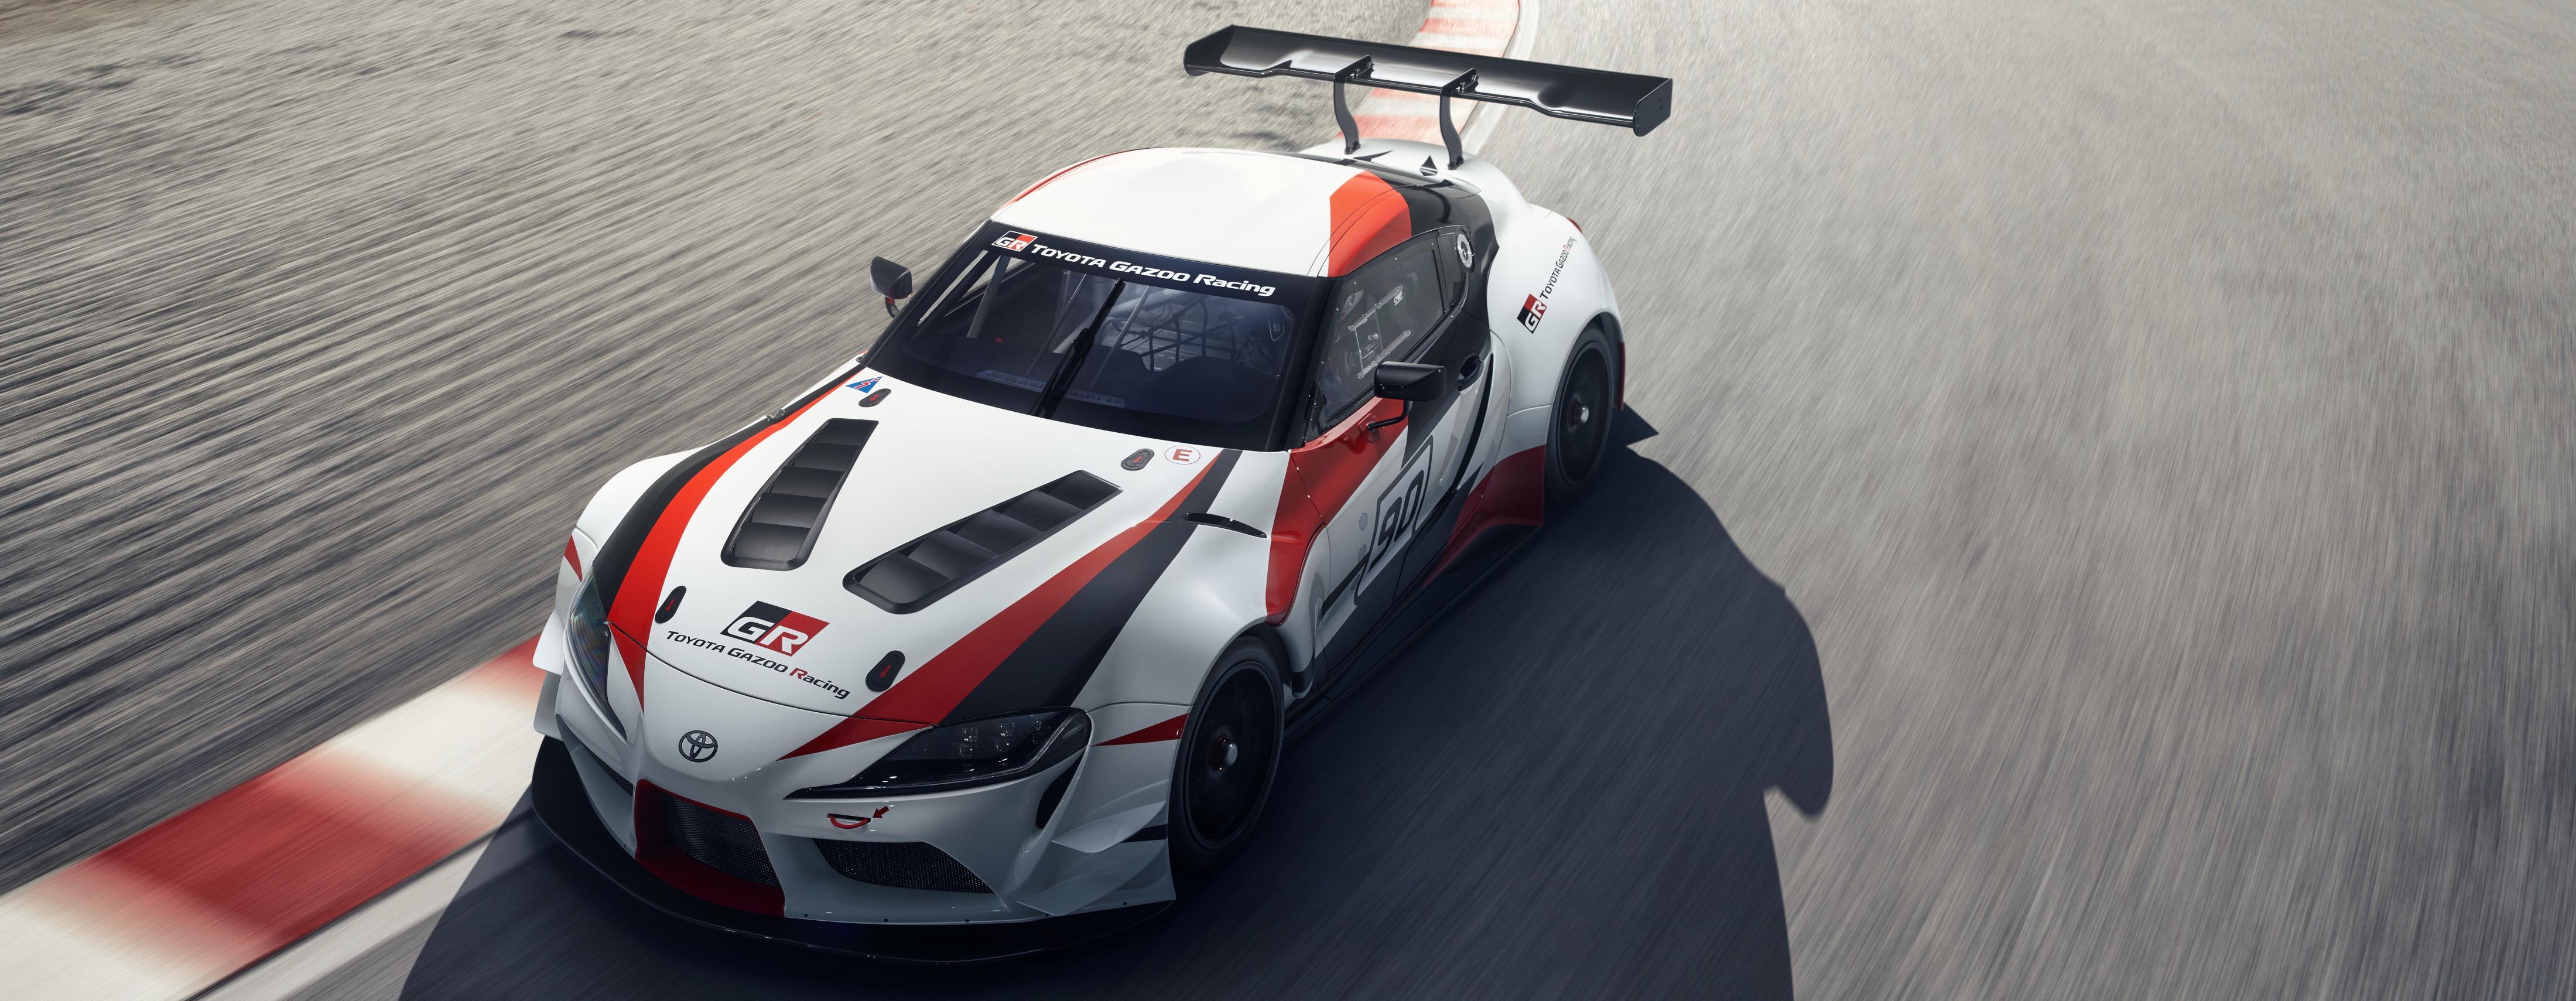 Toyota GR Supra Racing Concept, Adrenalina pura